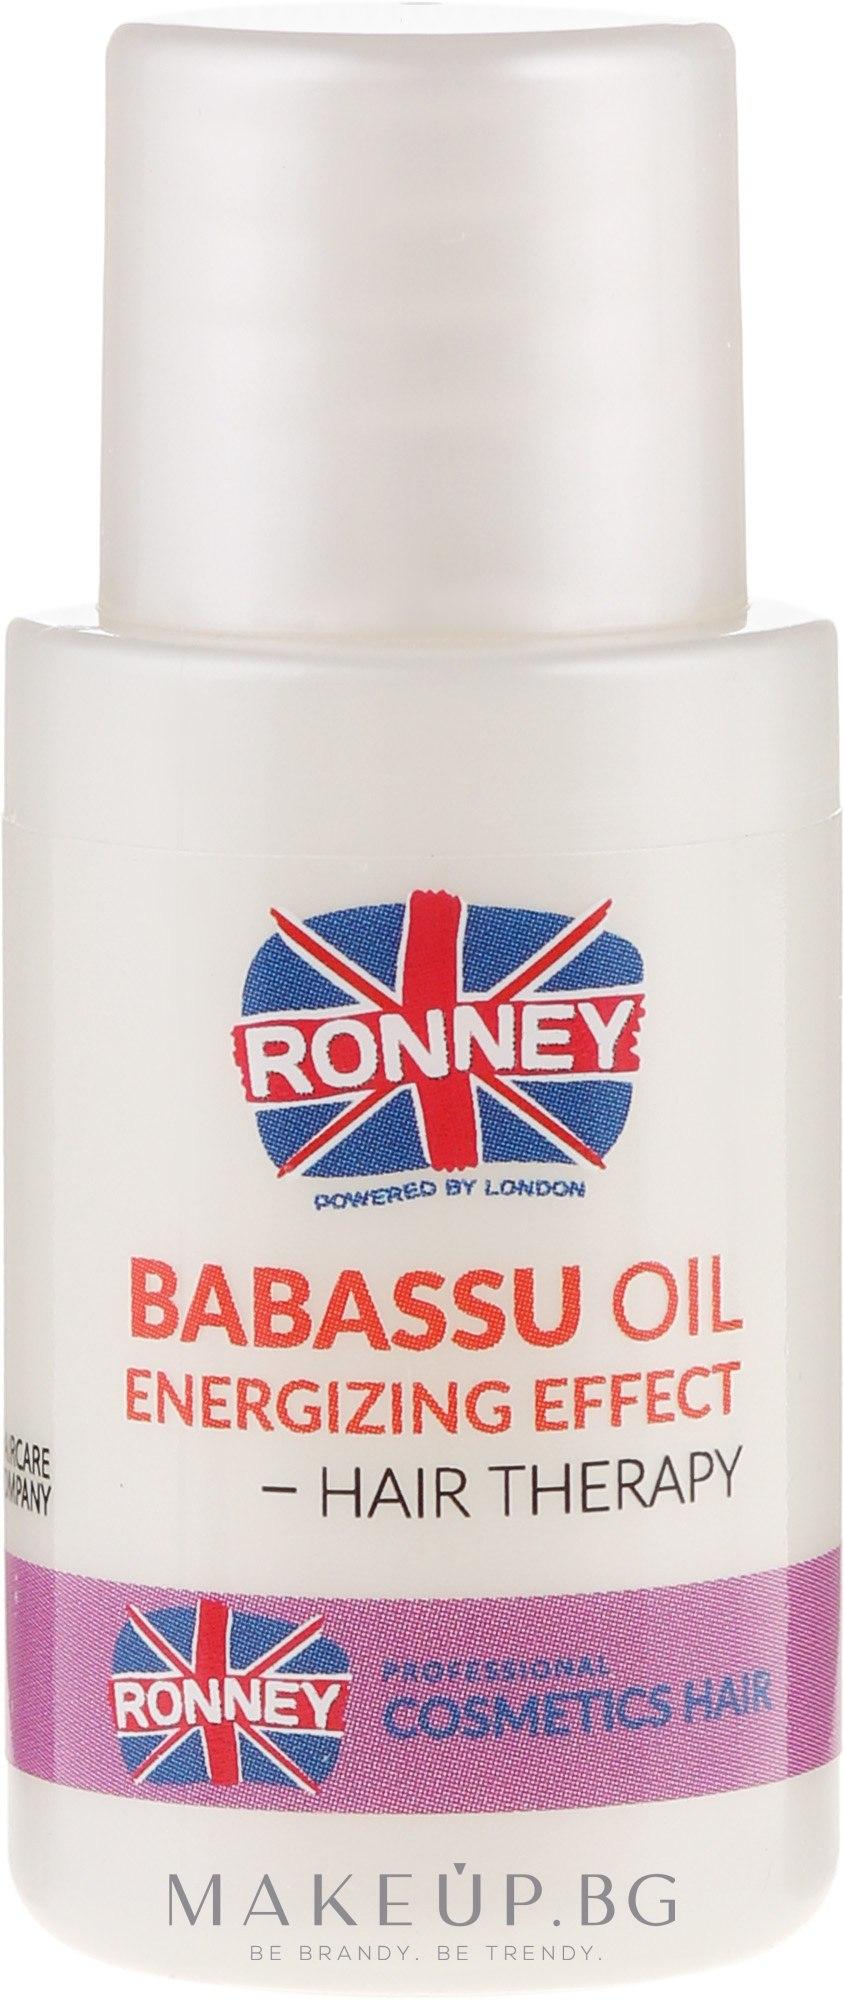 Масло от бабасу за коса - Ronney Babassu Oil Energizing Effect Hair Therapy — снимка 15 ml